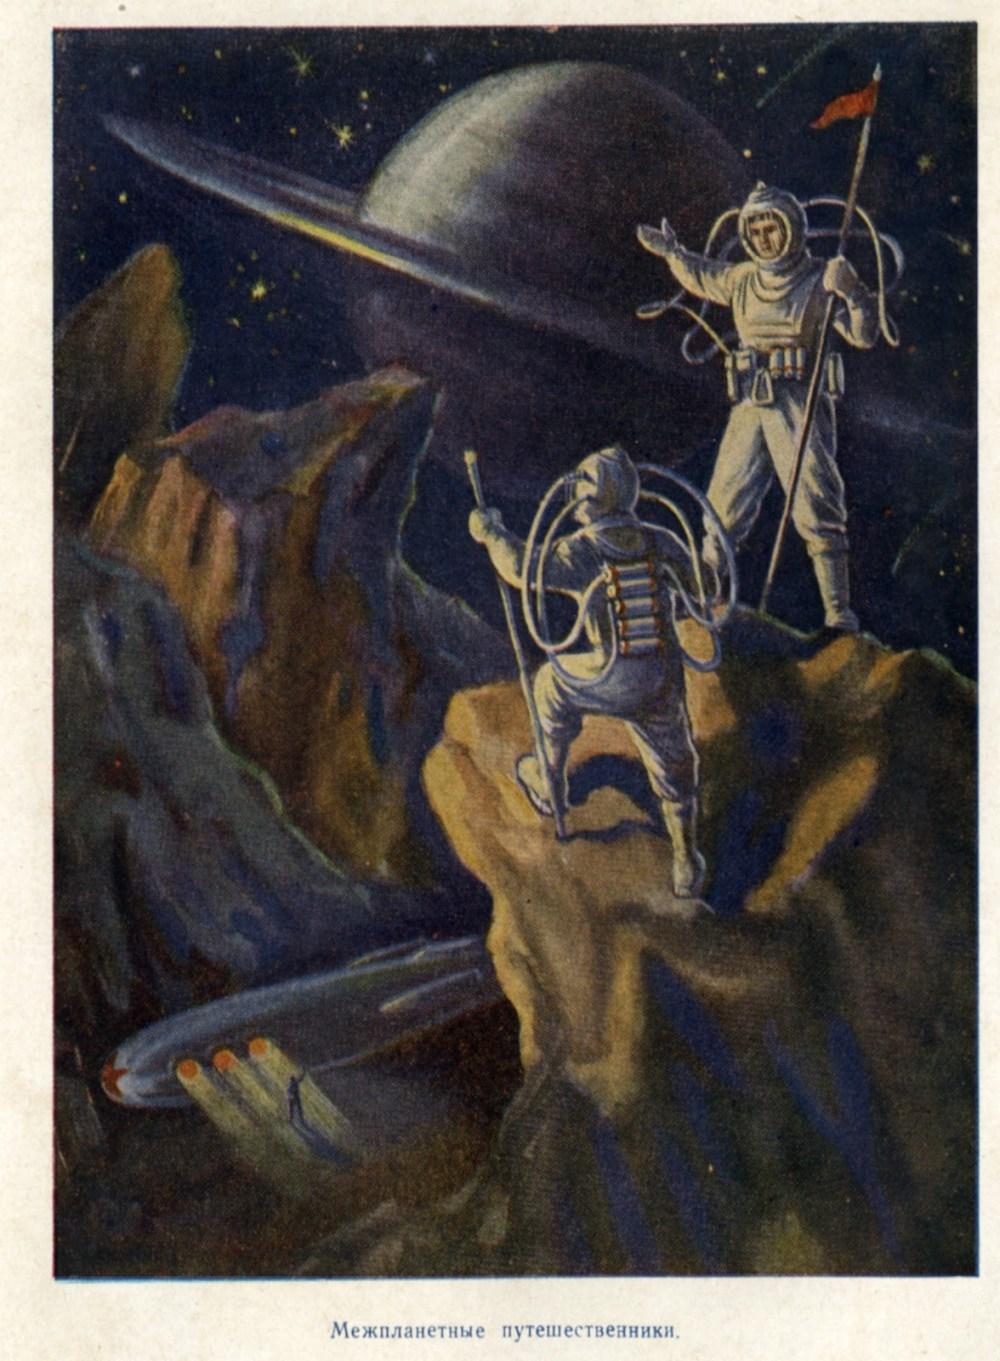 Saturn conquest